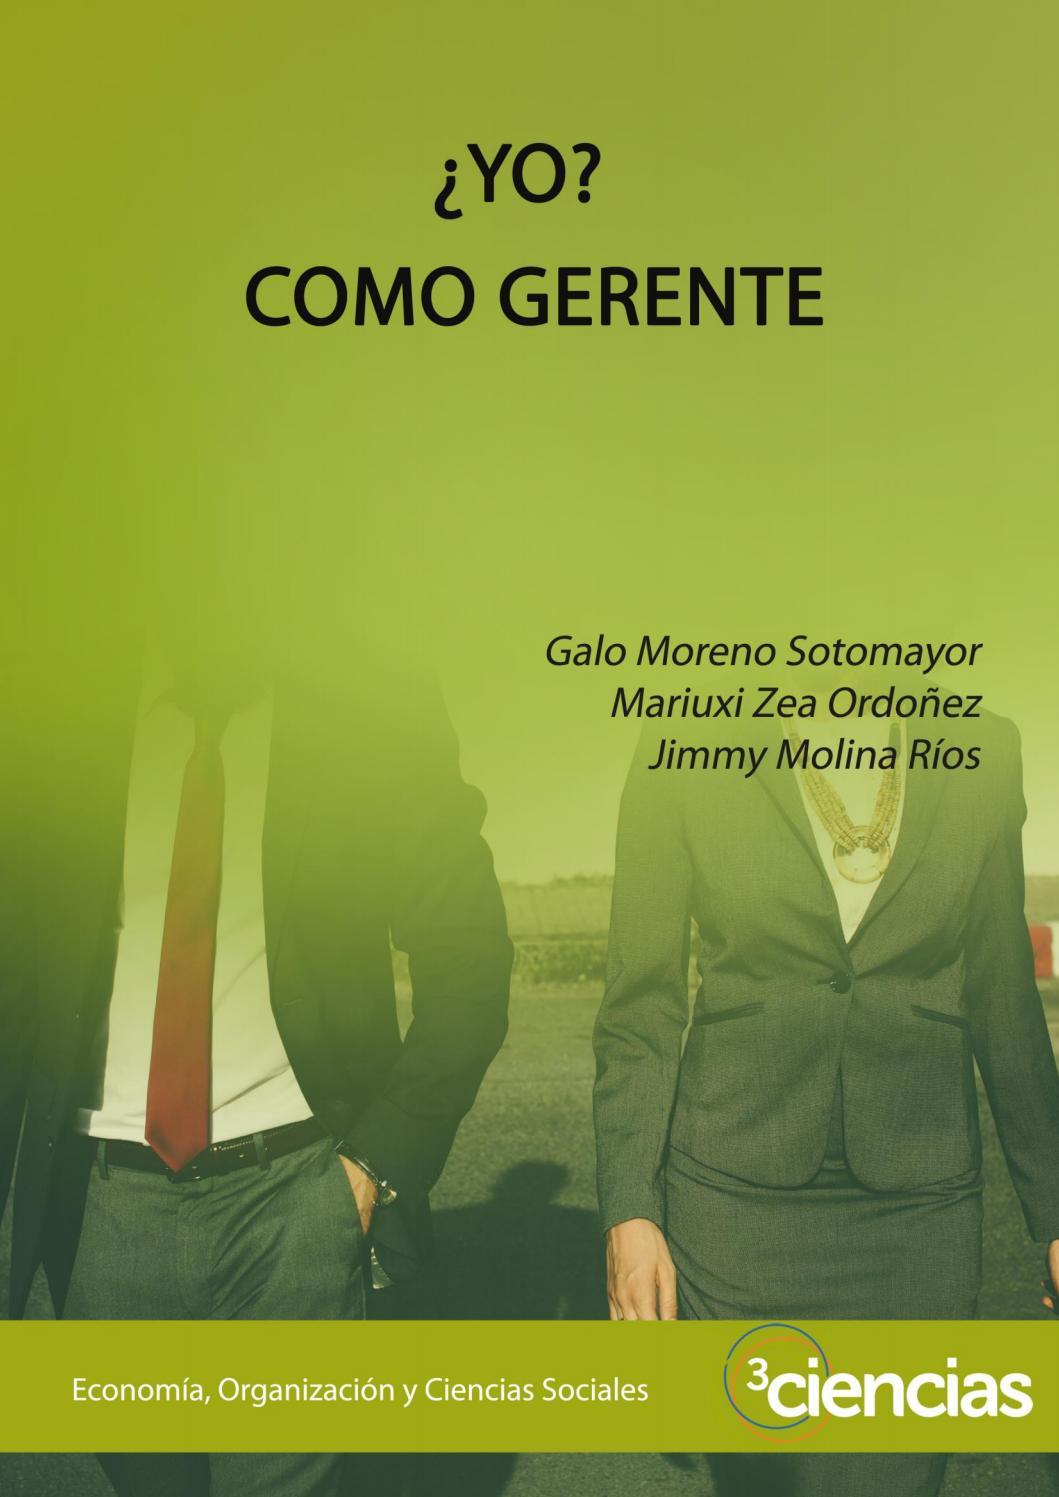 Yo como gerente by Carolina Arroyo - issuu